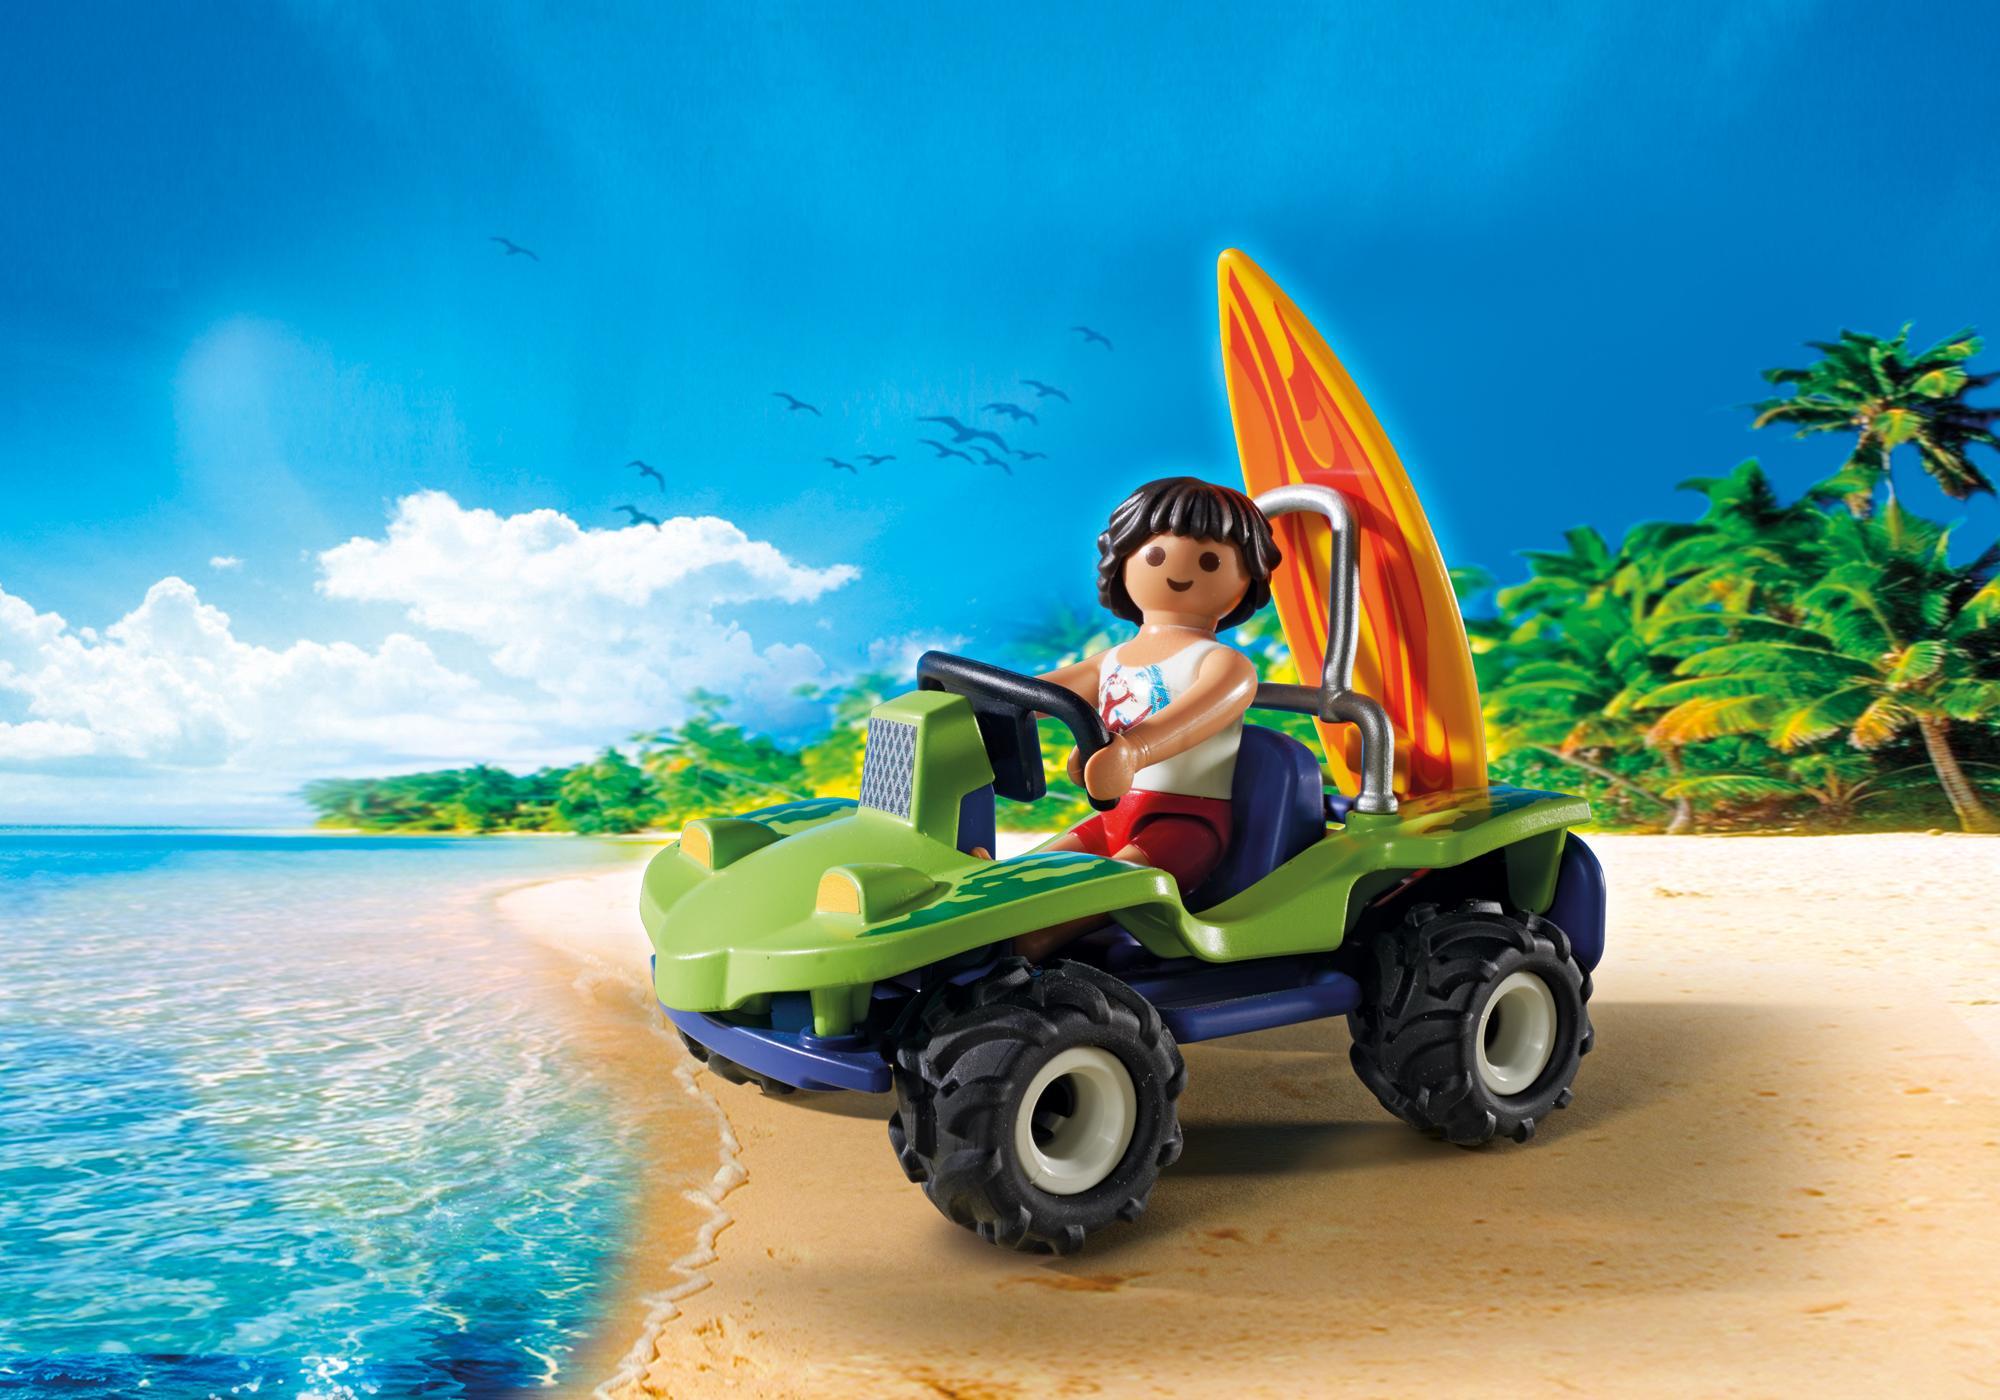 http://media.playmobil.com/i/playmobil/6982_product_extra1/Surfer mit Strandbuggy